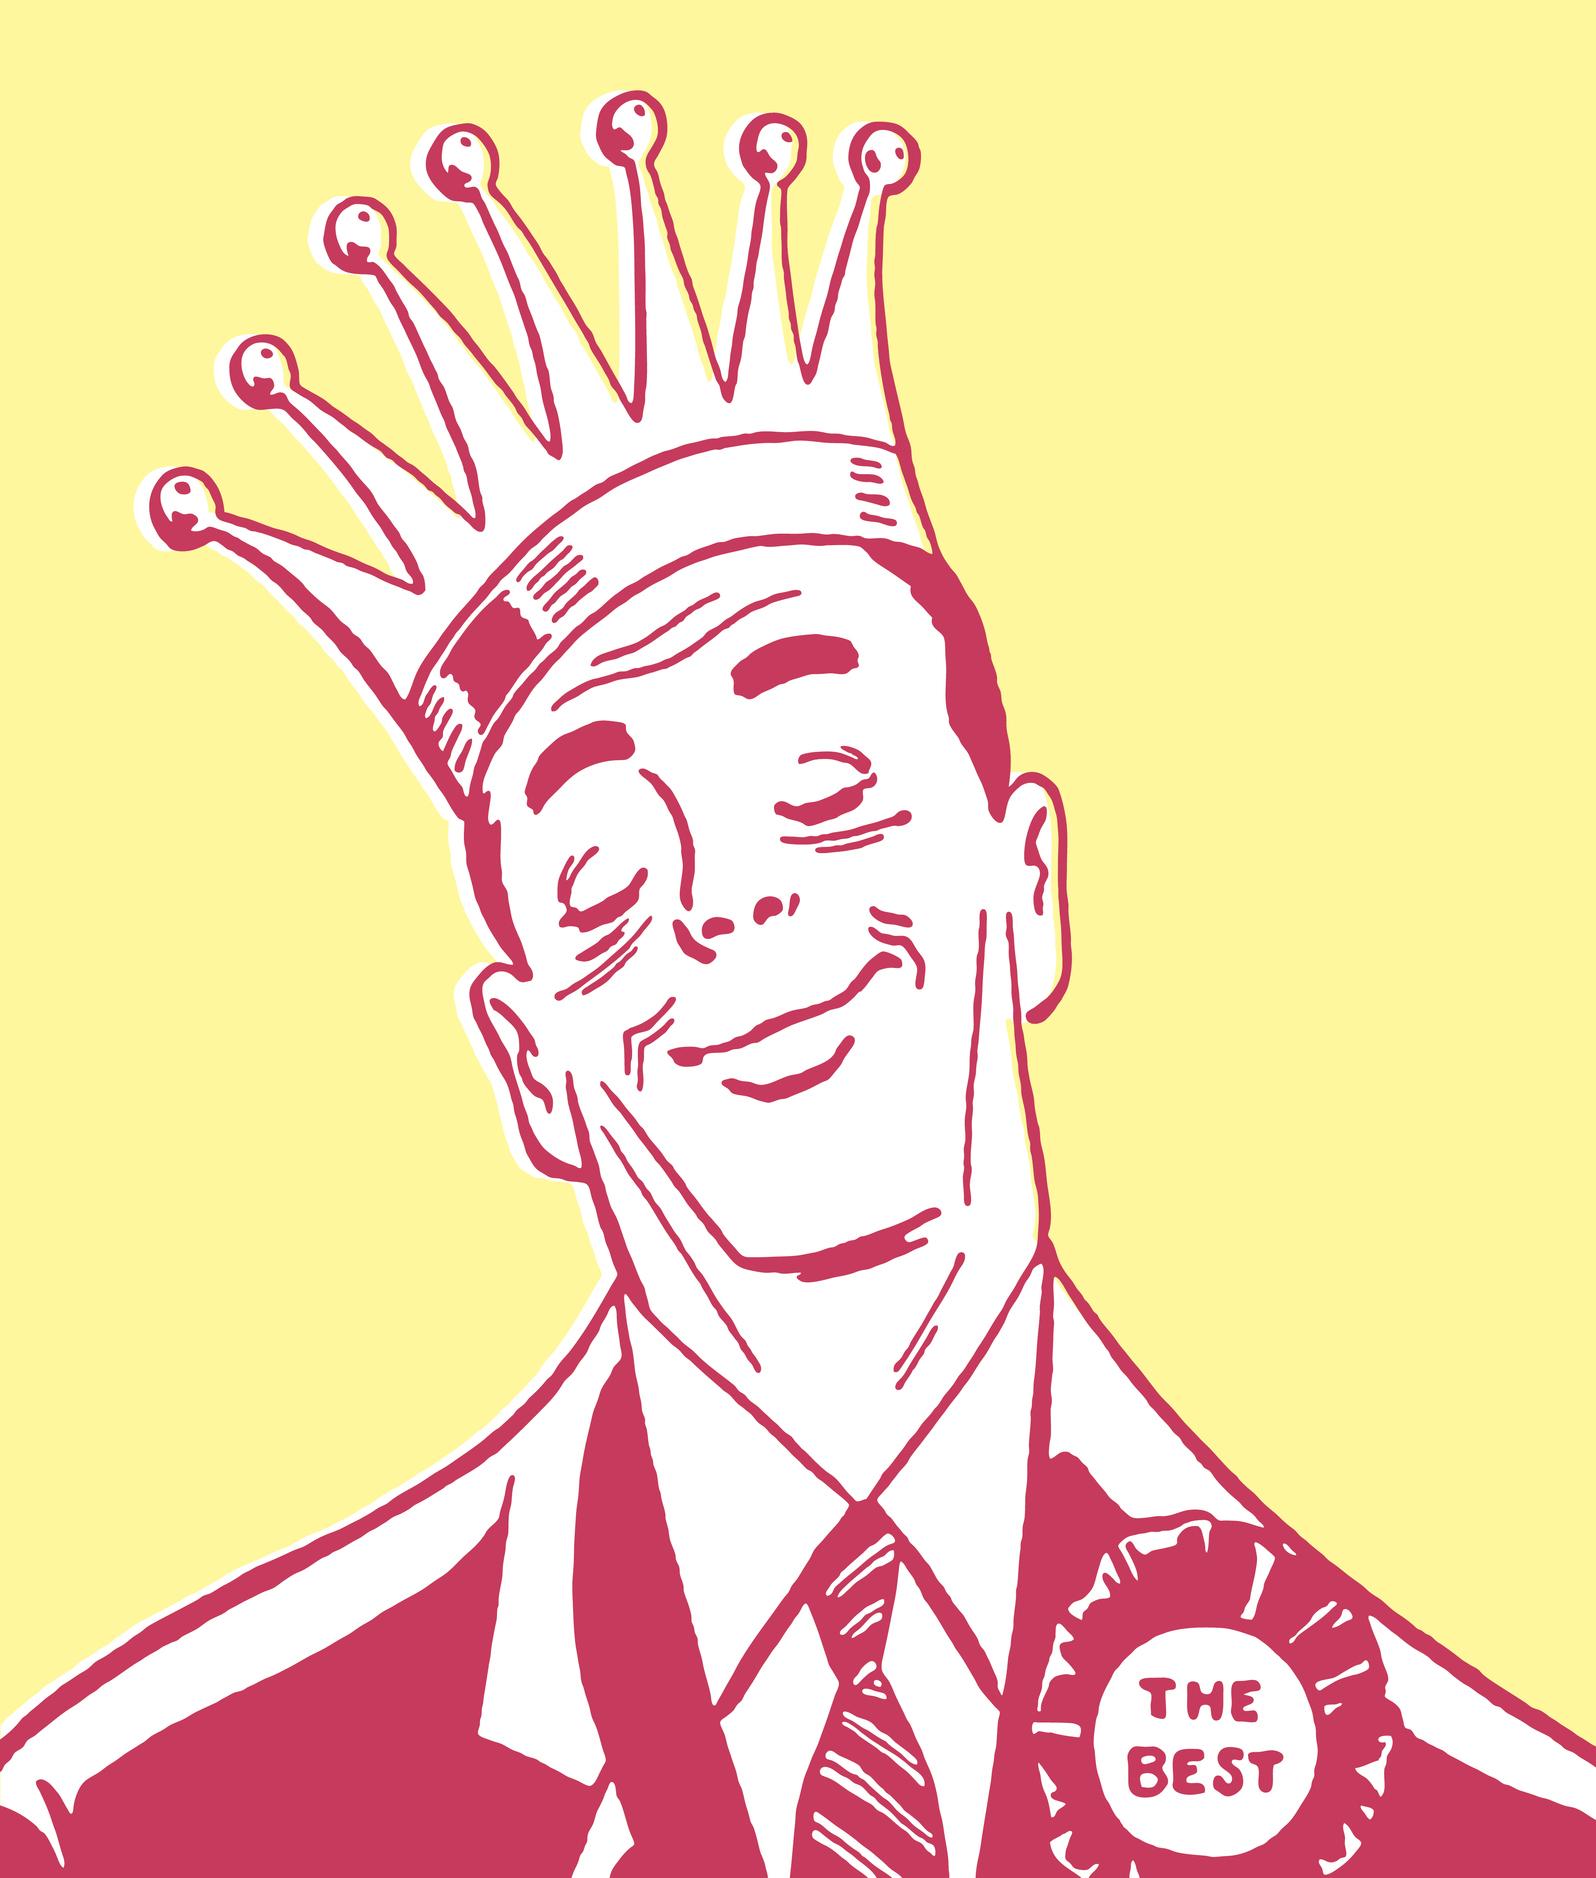 vintage man with crown on head illustration